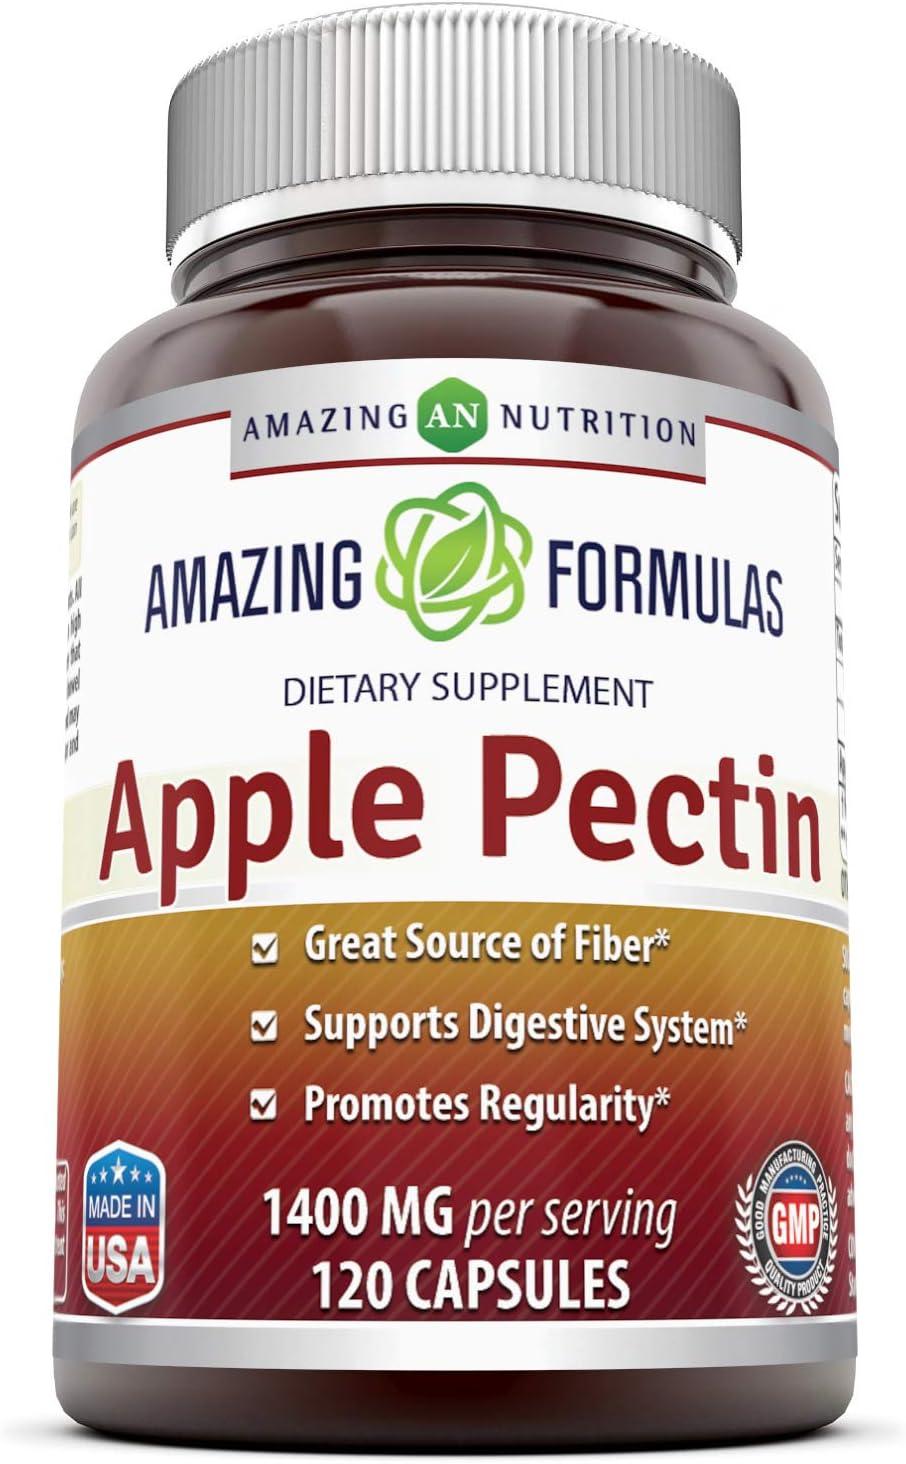 Amazing Formulas Apple Pectin Dietary Supplement - 1400 mg per Serving of 2 Capsules- 120 Capsules Per Bottle - Good Source of Fiber, Promotes Digestive Health, Promotes Regularity*